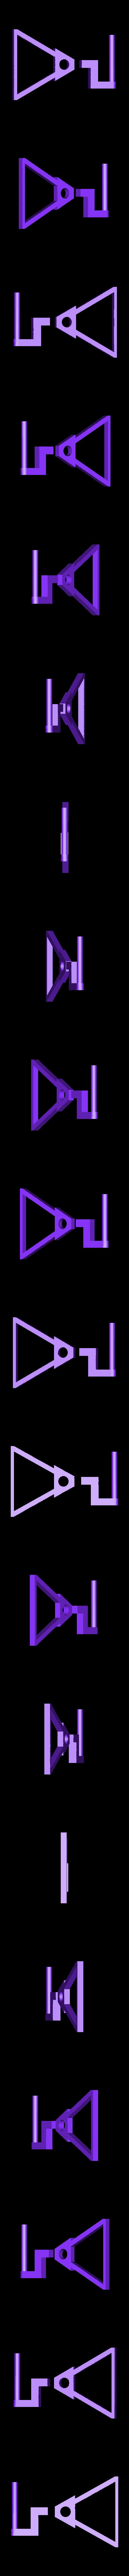 Hitch.stl Download free STL file HO Scale Office Trailer • 3D printer design, kabrumble